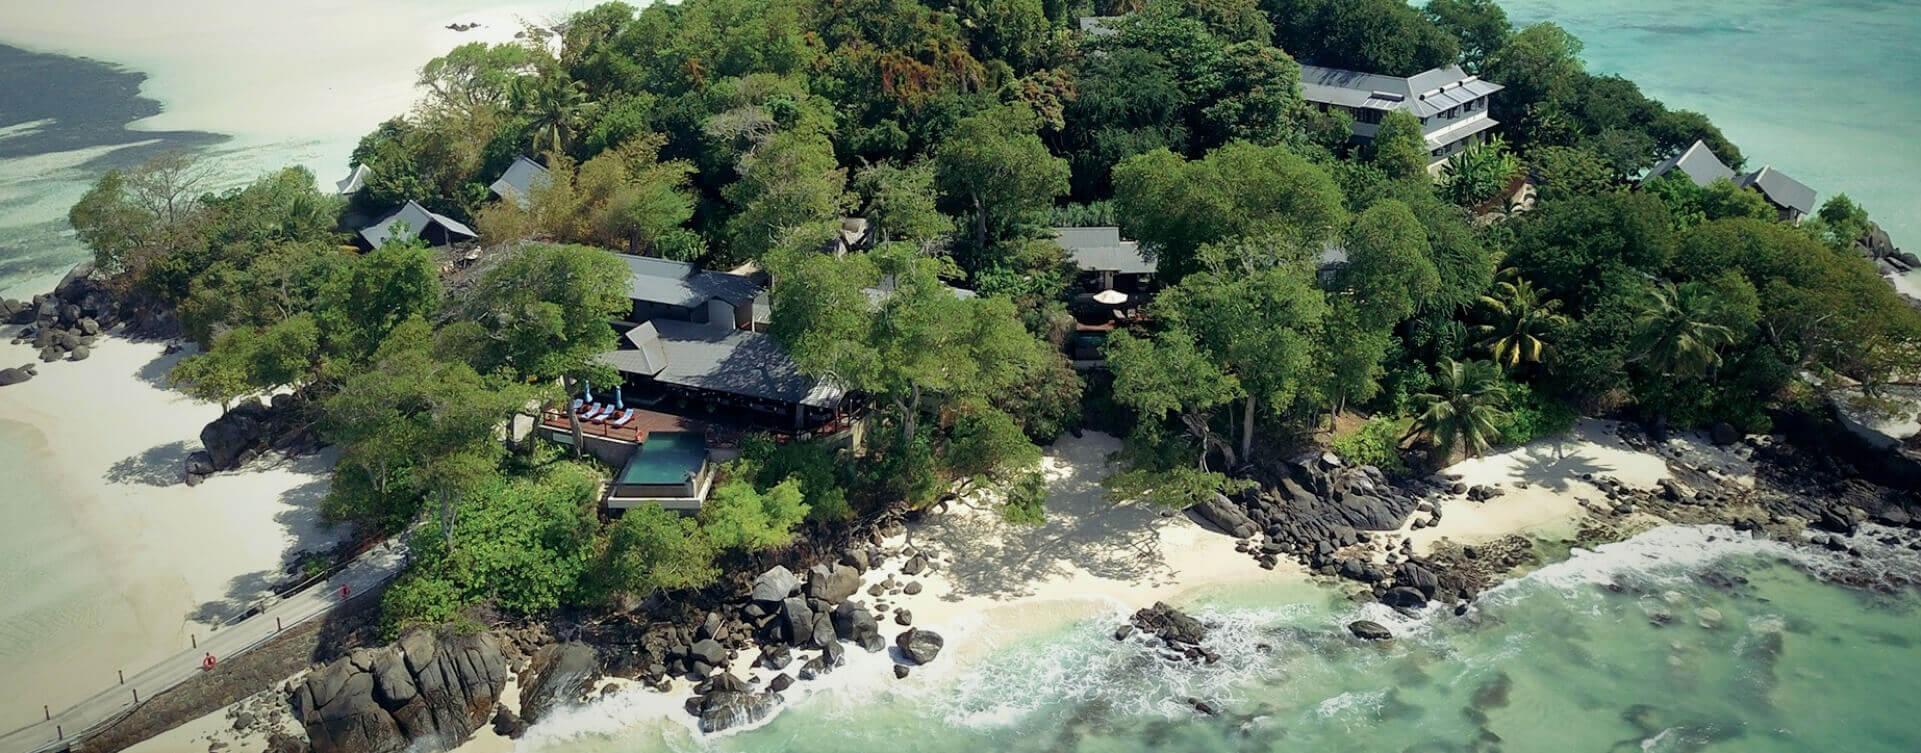 Aerial View Of JA Enchanted Island Resort